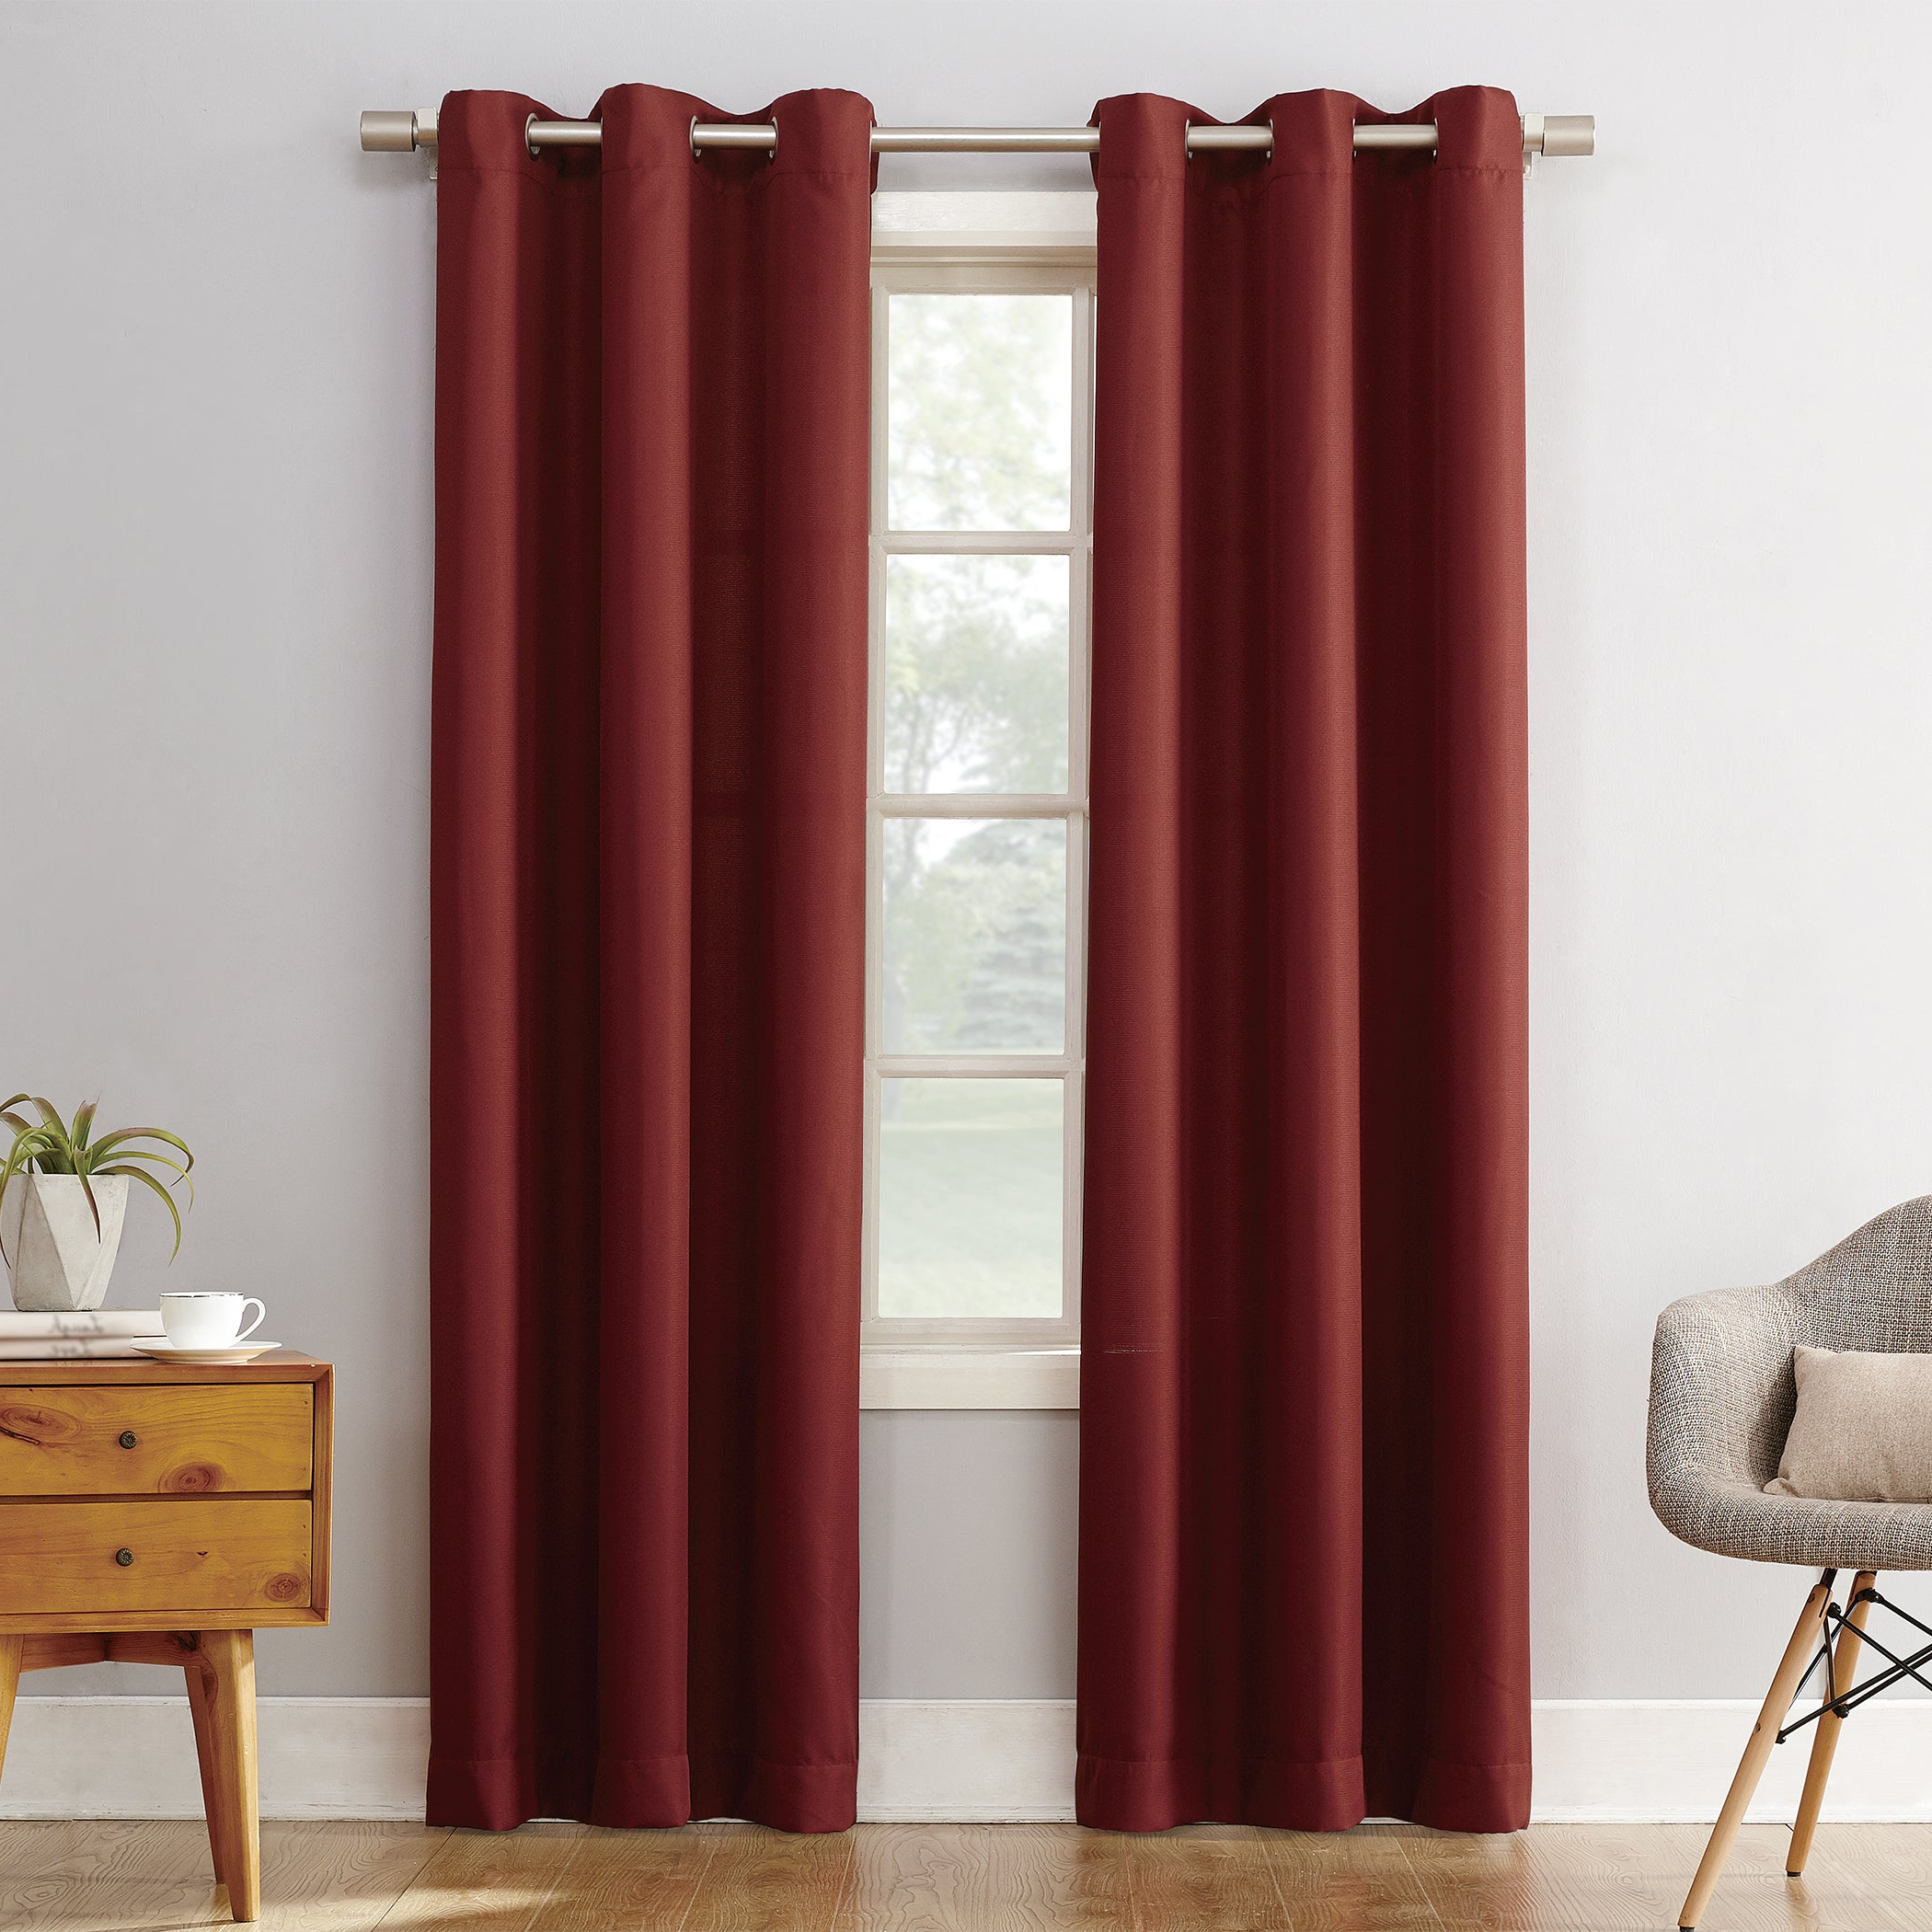 Popular Copper Grove Speedwell Grommet Window Curtain Panels For Shop Copper Grove Speedwell Grommet Window Curtain Panel (View 15 of 20)